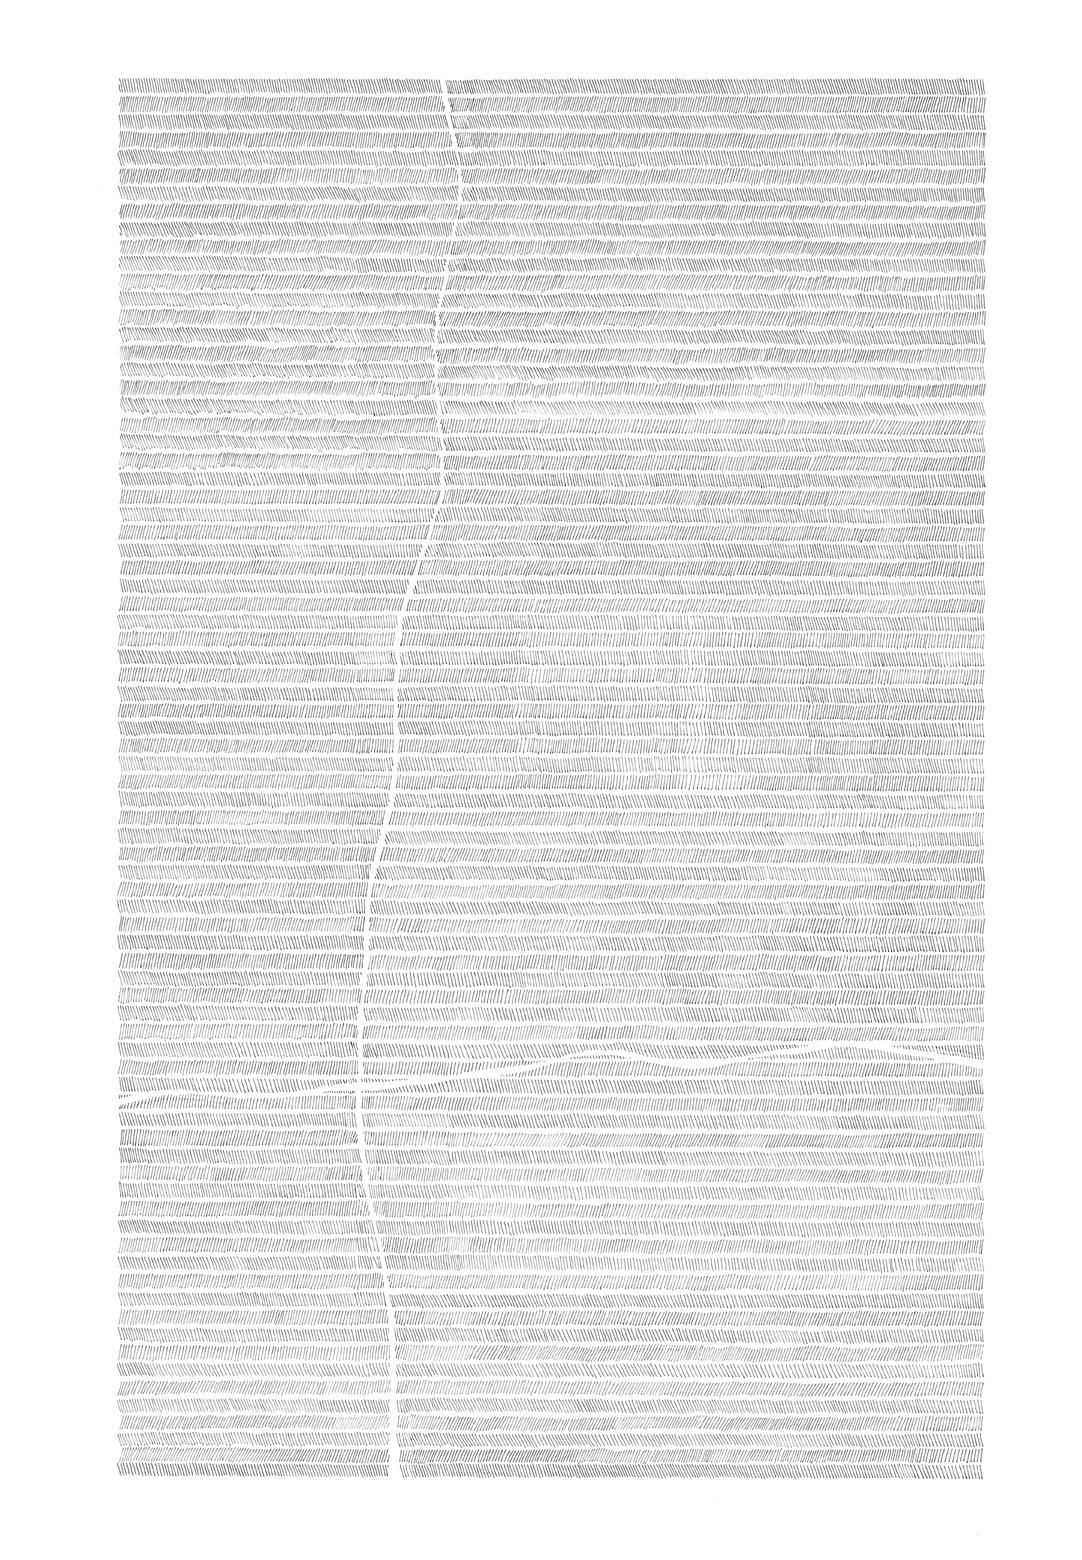 drawing 005_0_0.jpg